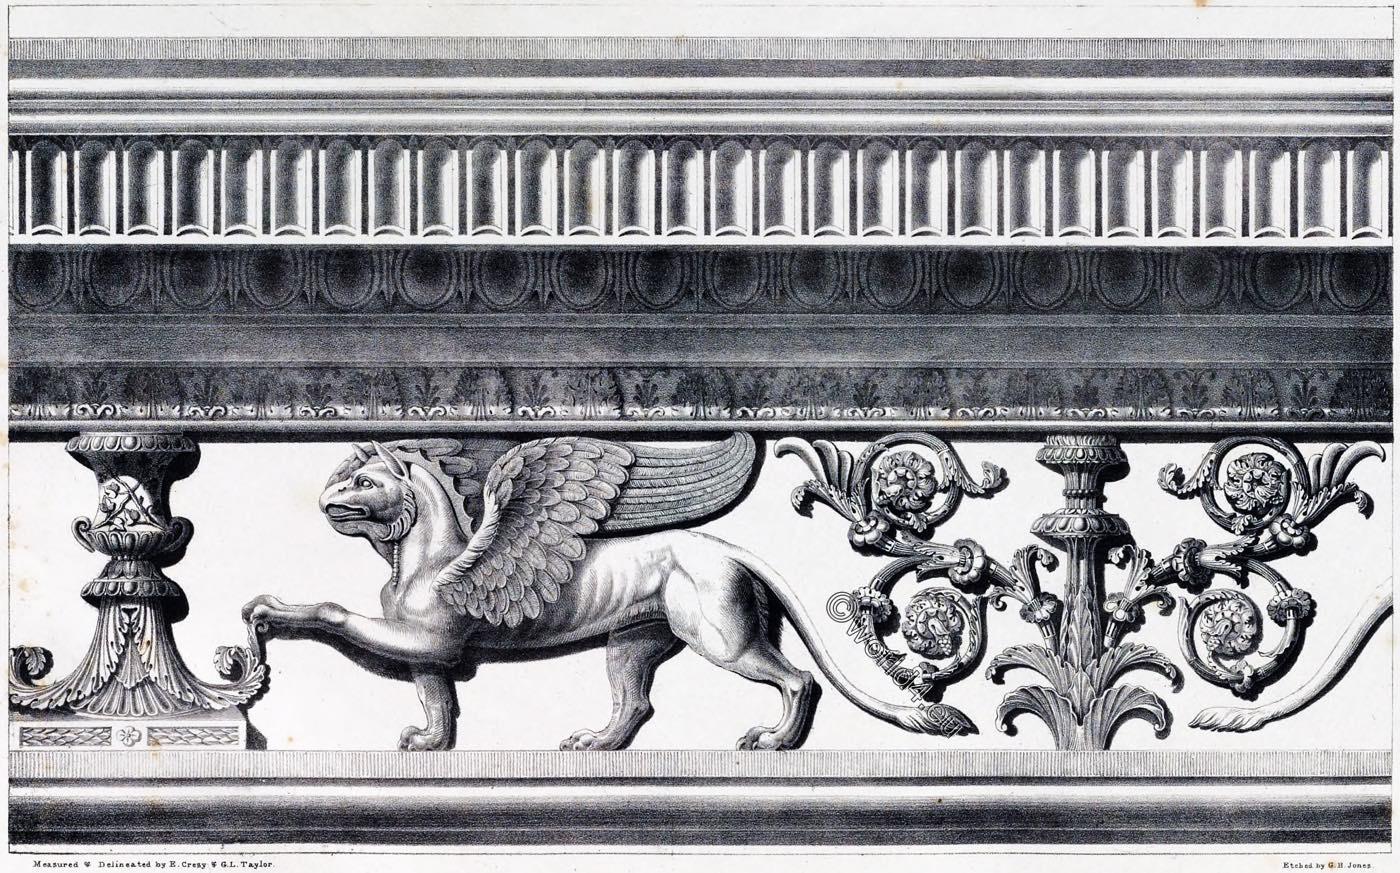 Rome, Temple, Antonius, Faustina, Frieze, Cornice, Ornament, Decoration, Architecture, antiquities,